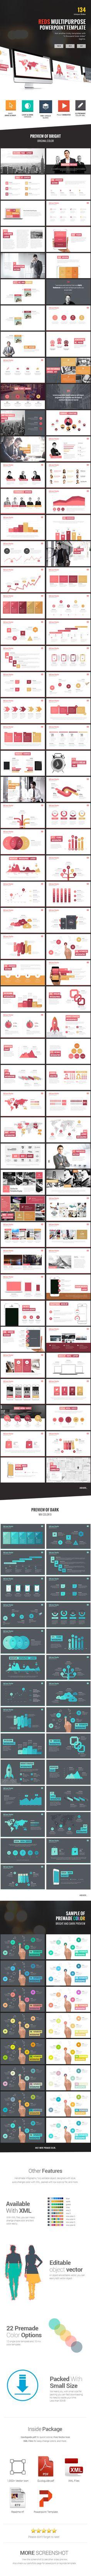 Red's - Creative Multipurpose Powerpoint Template #design #slides Download: http://graphicriver.net/item/reds-creative-multipurpose-powerpoint-template/13825795?ref=ksioks